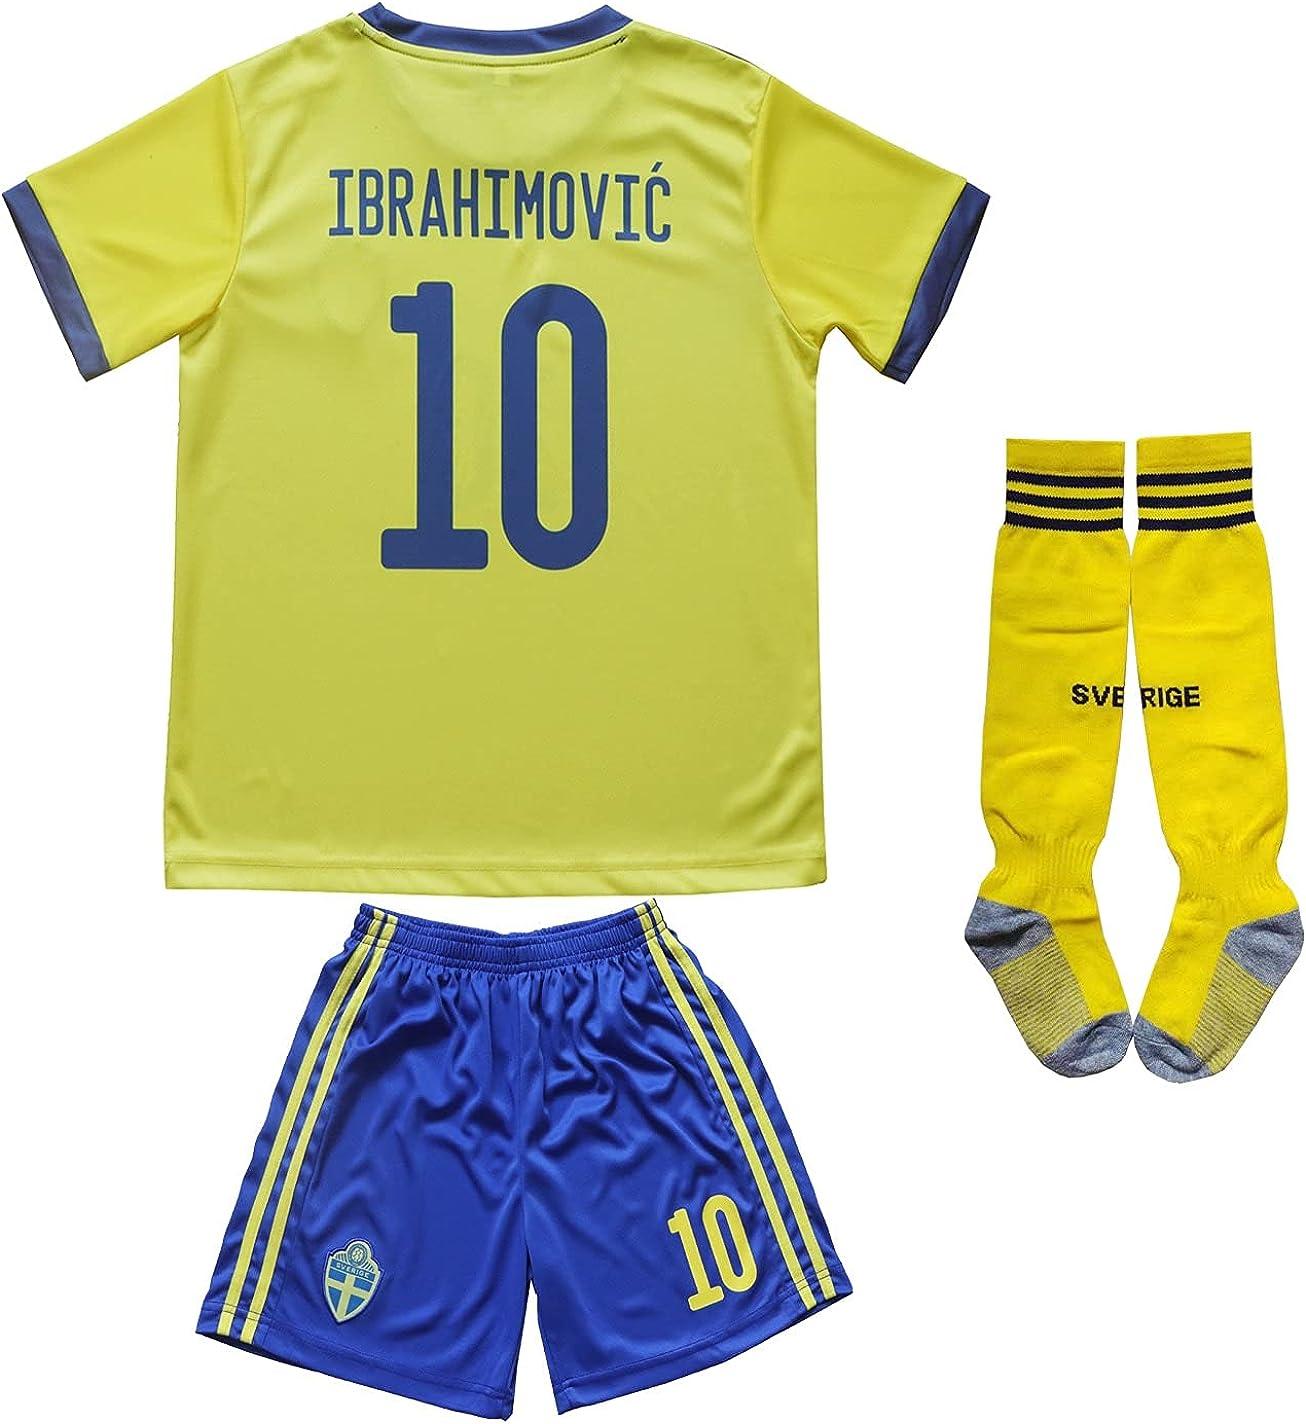 Necm 2021 Sweden #10 Zlatan Ibrahimovic Kids Home Max Super sale 84% OFF Socce Football